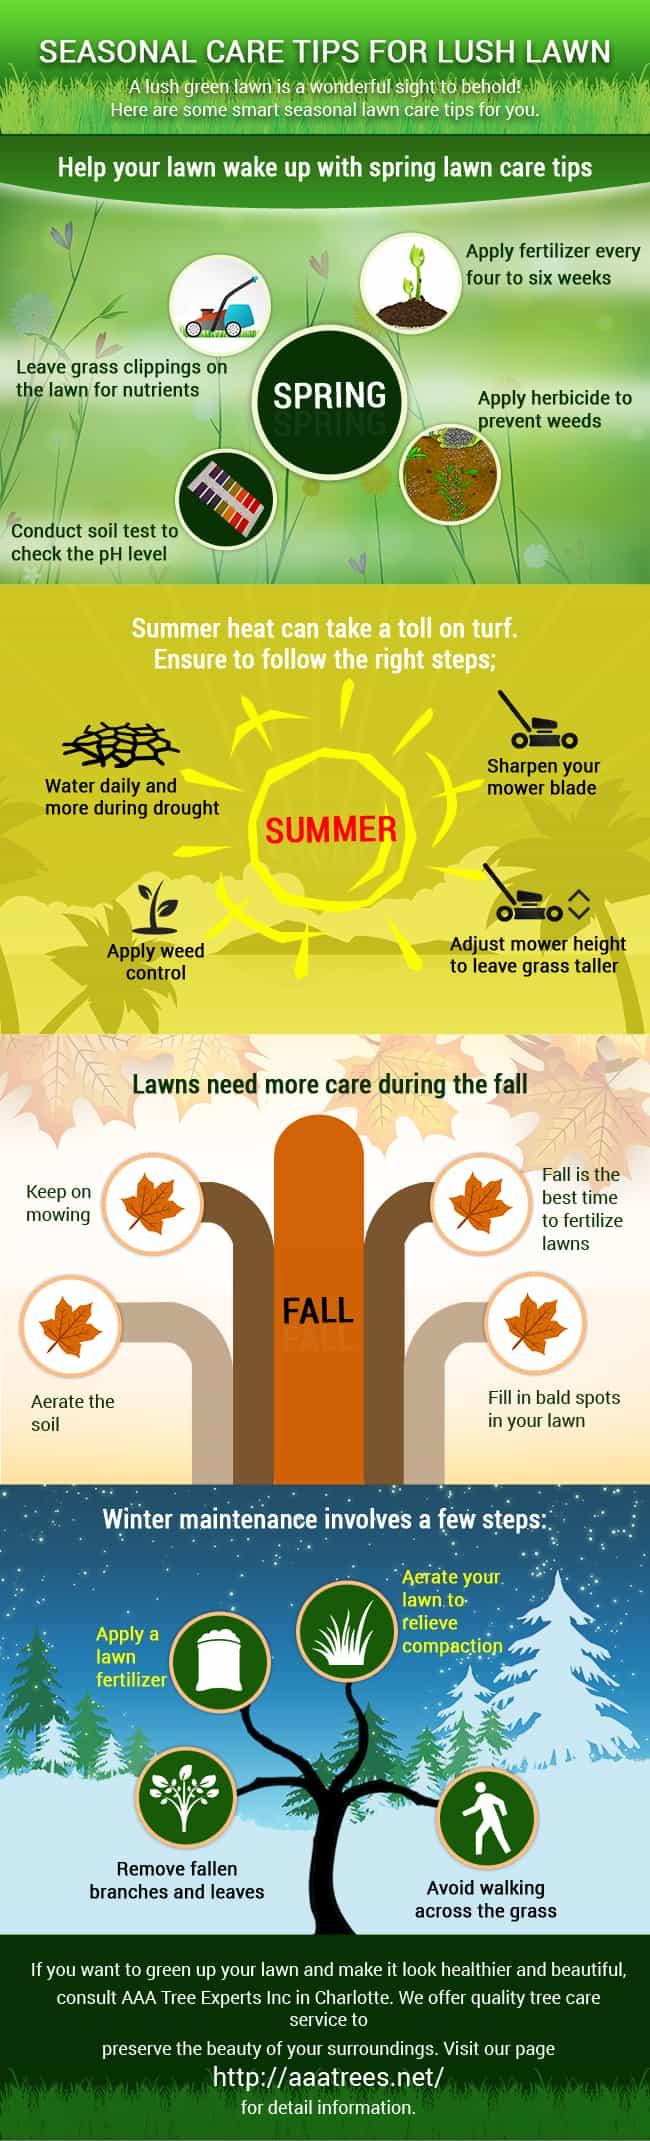 Lush lawn, season lawn care tips infographics